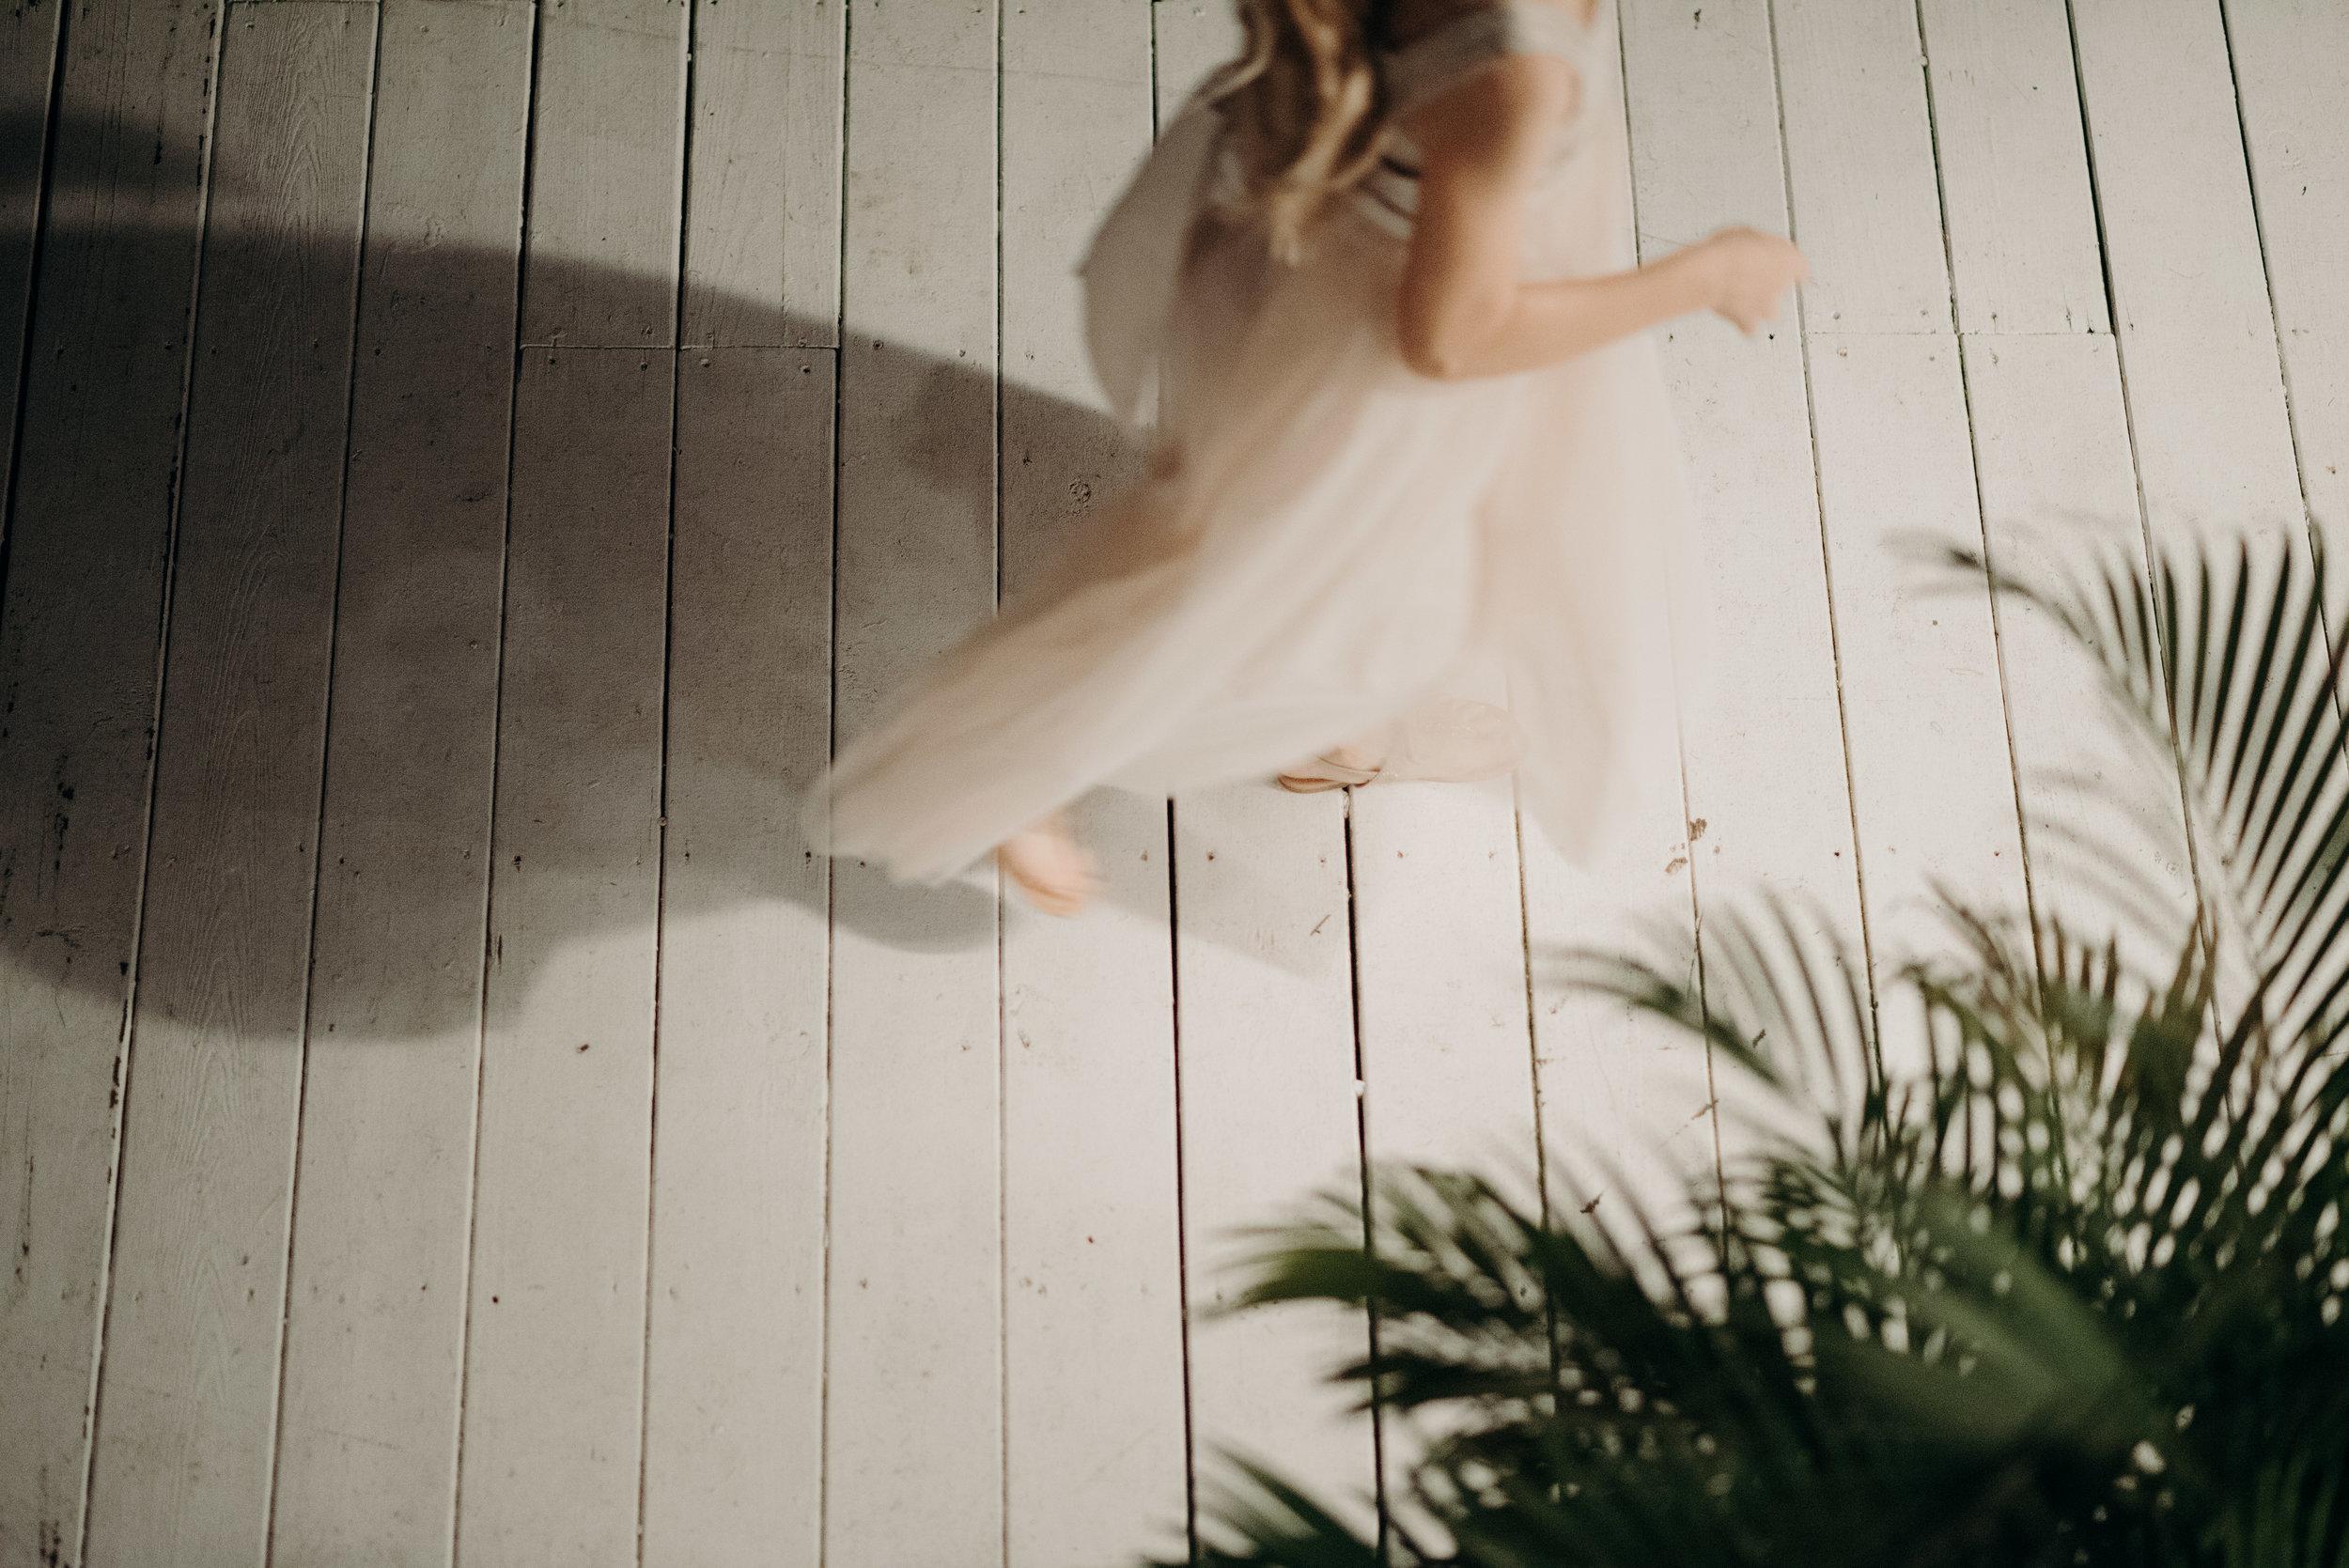 micayla-greyson-neumann-vero-beach-lake-house-winter-white-wedding-photography-1396.jpg